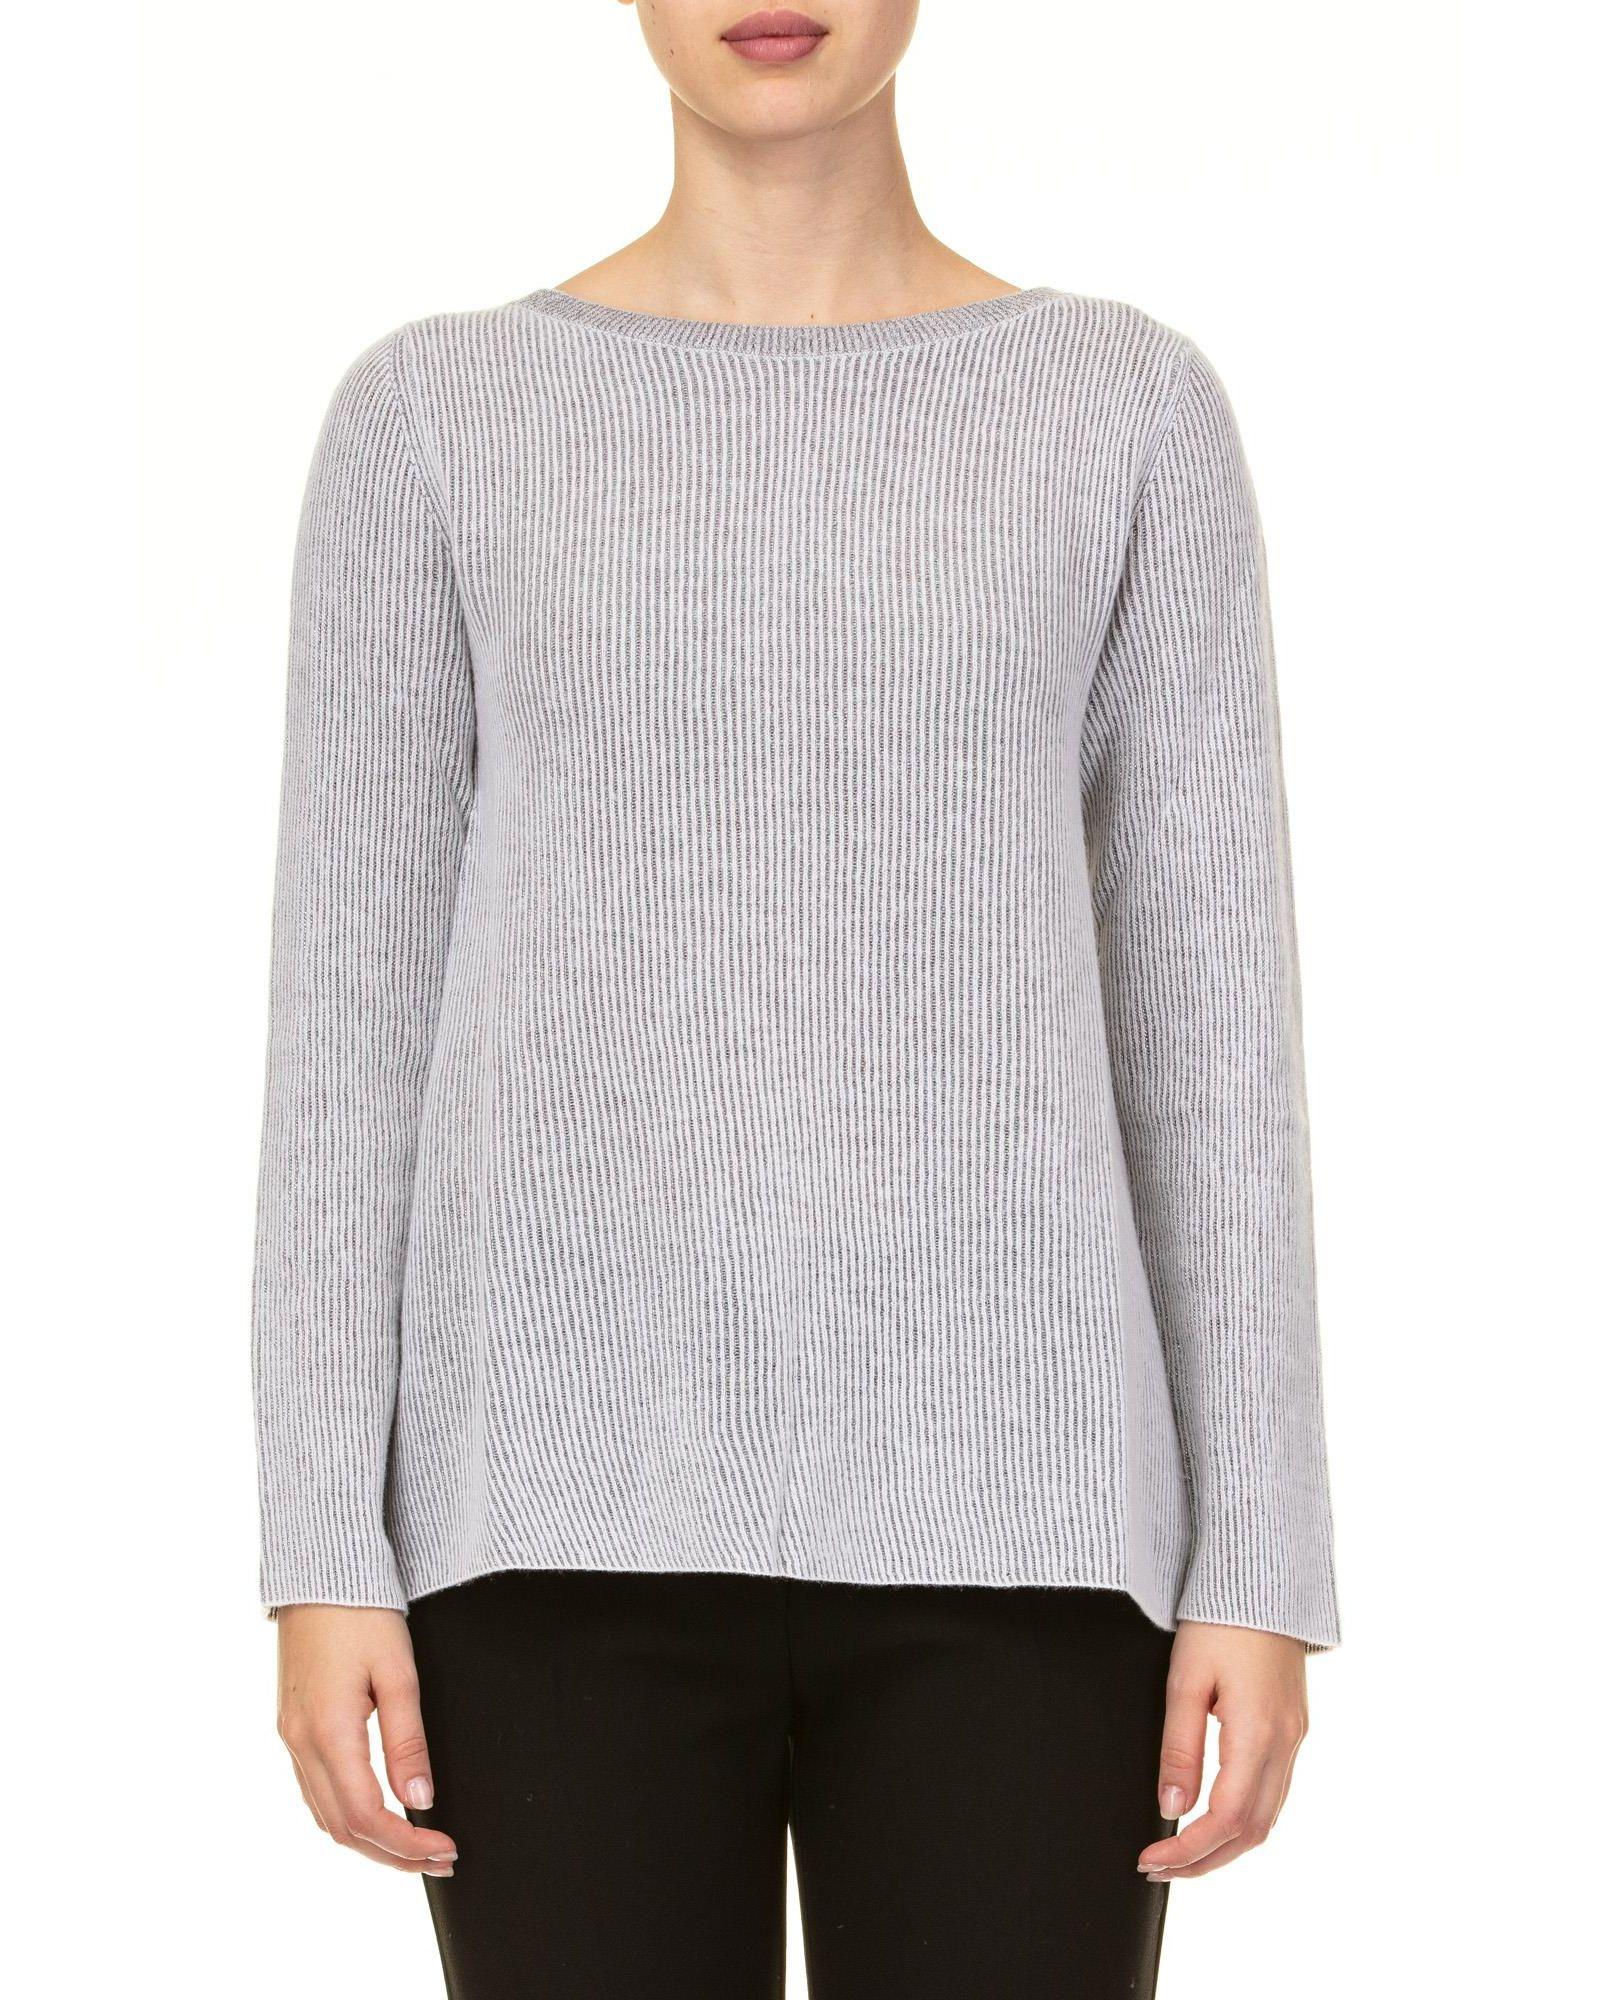 KANGRA Alpaca Blend And Lurex Sweater in Pearl